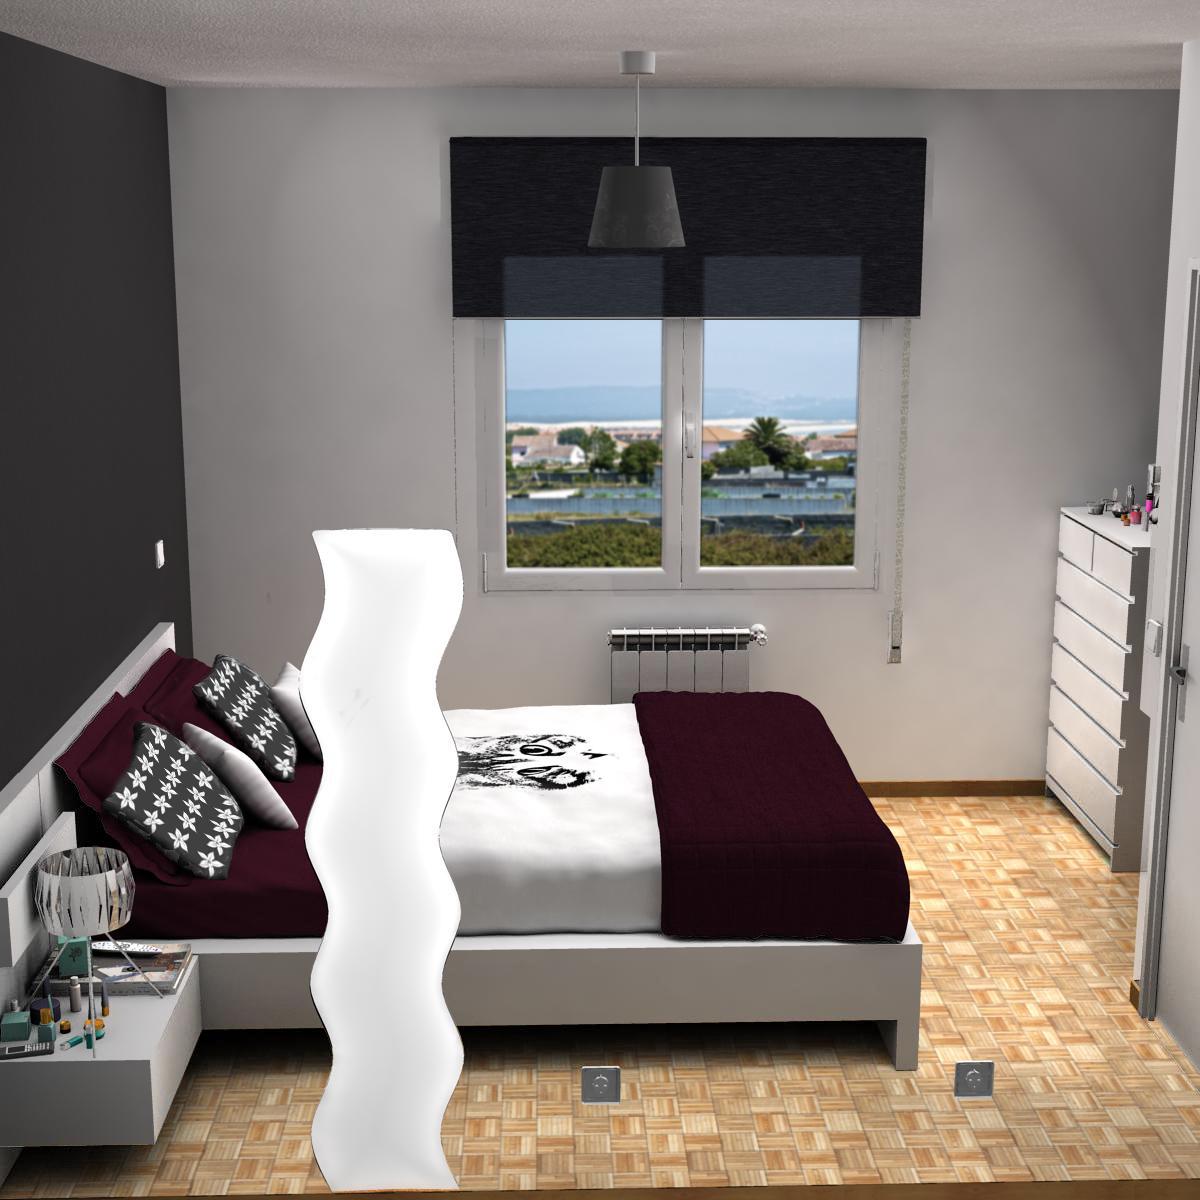 guļamistaba 8 3d modelis 3ds max fbx c4d ma mb obj 159564